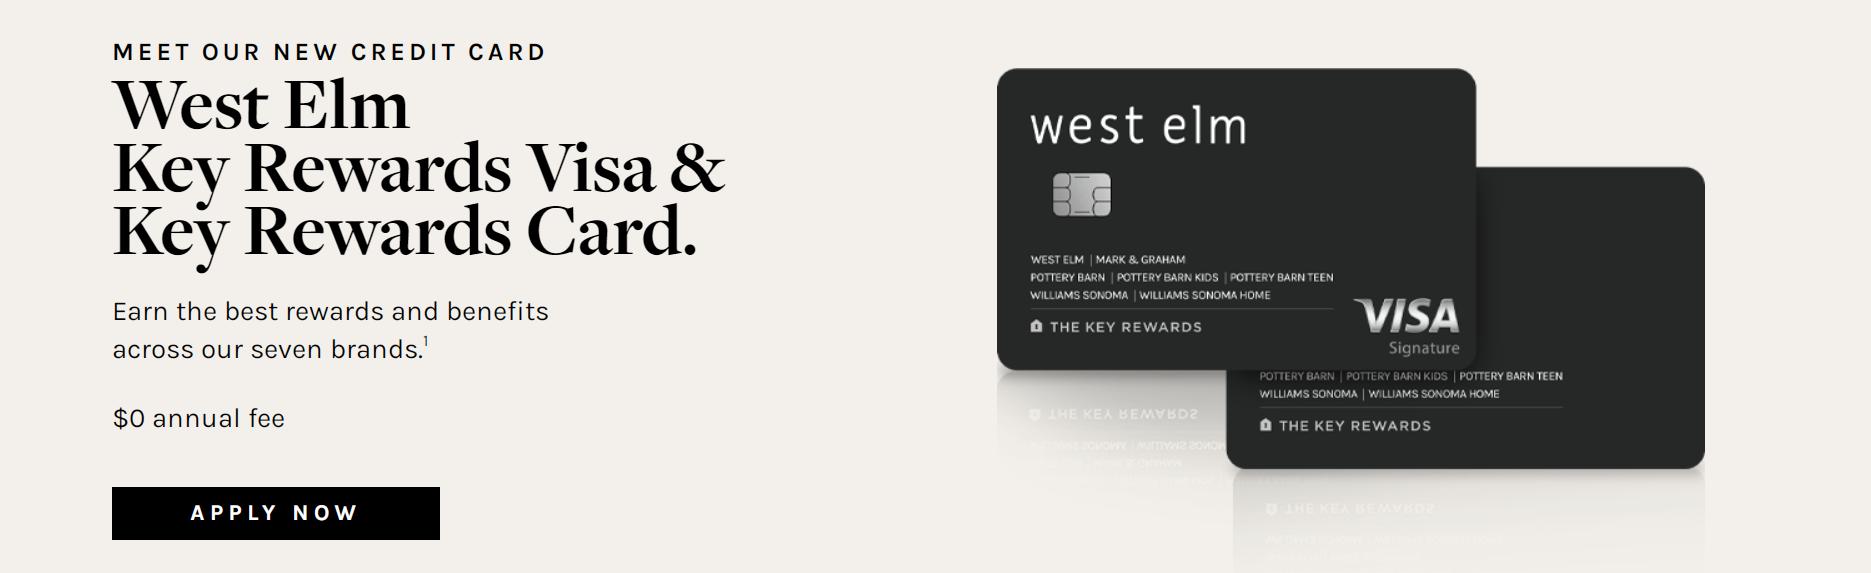 West Elm Promo Codes